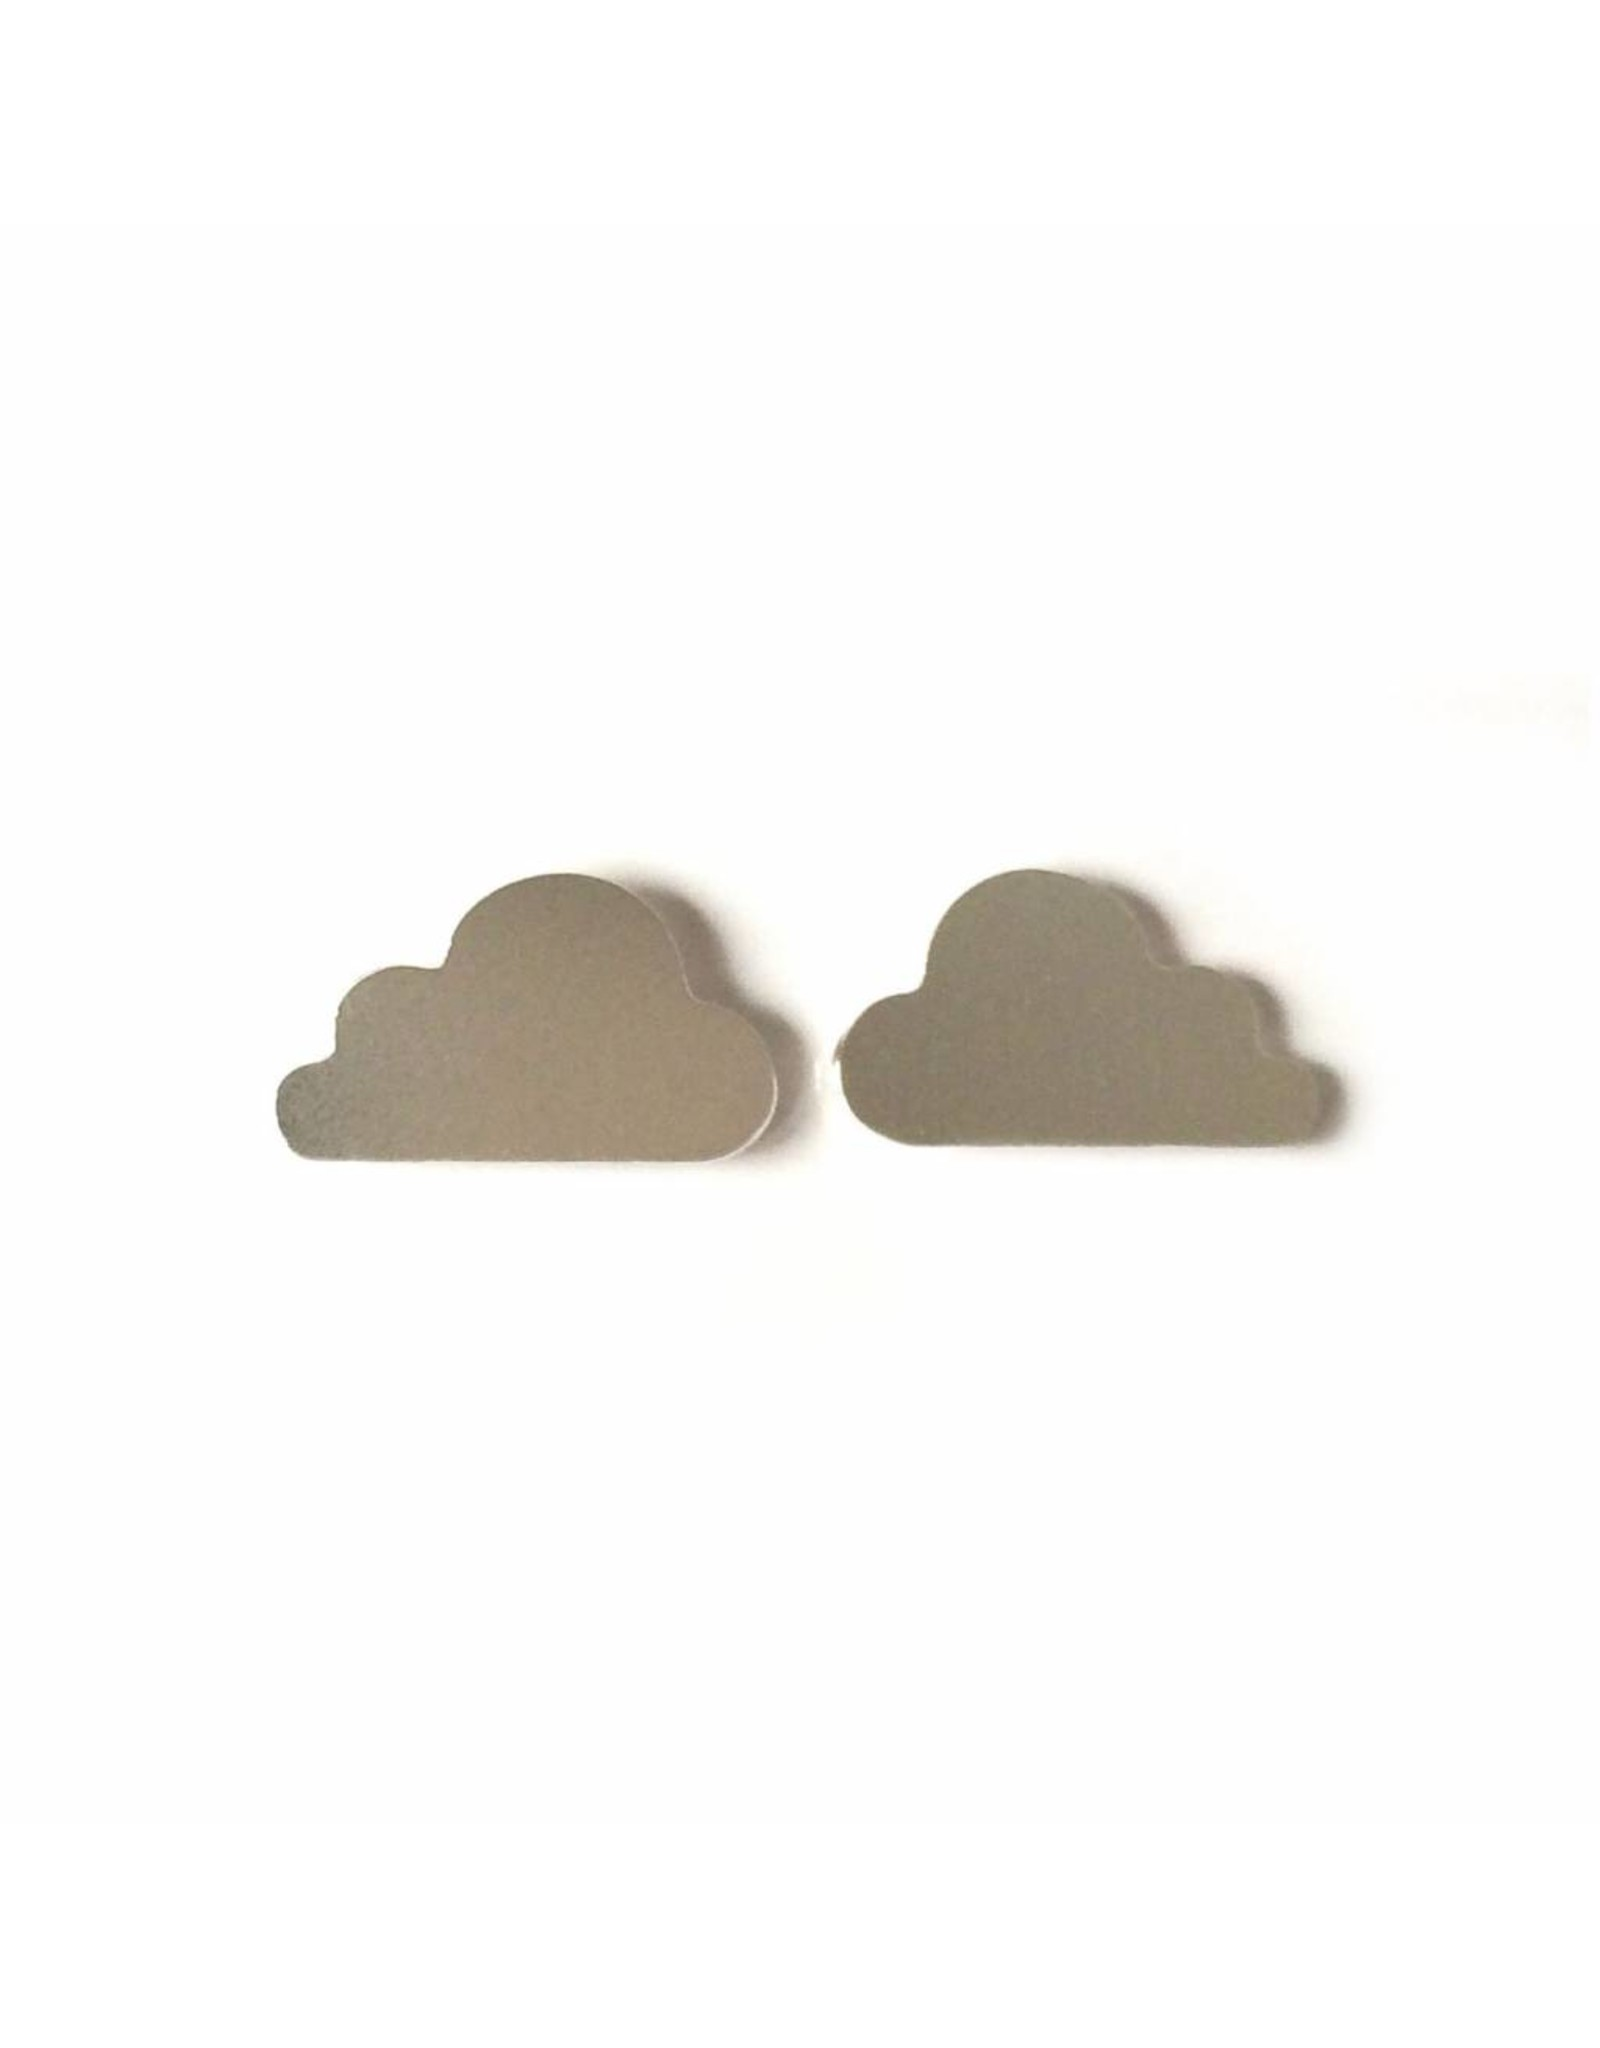 Stekertjes wolk zilverkleurig